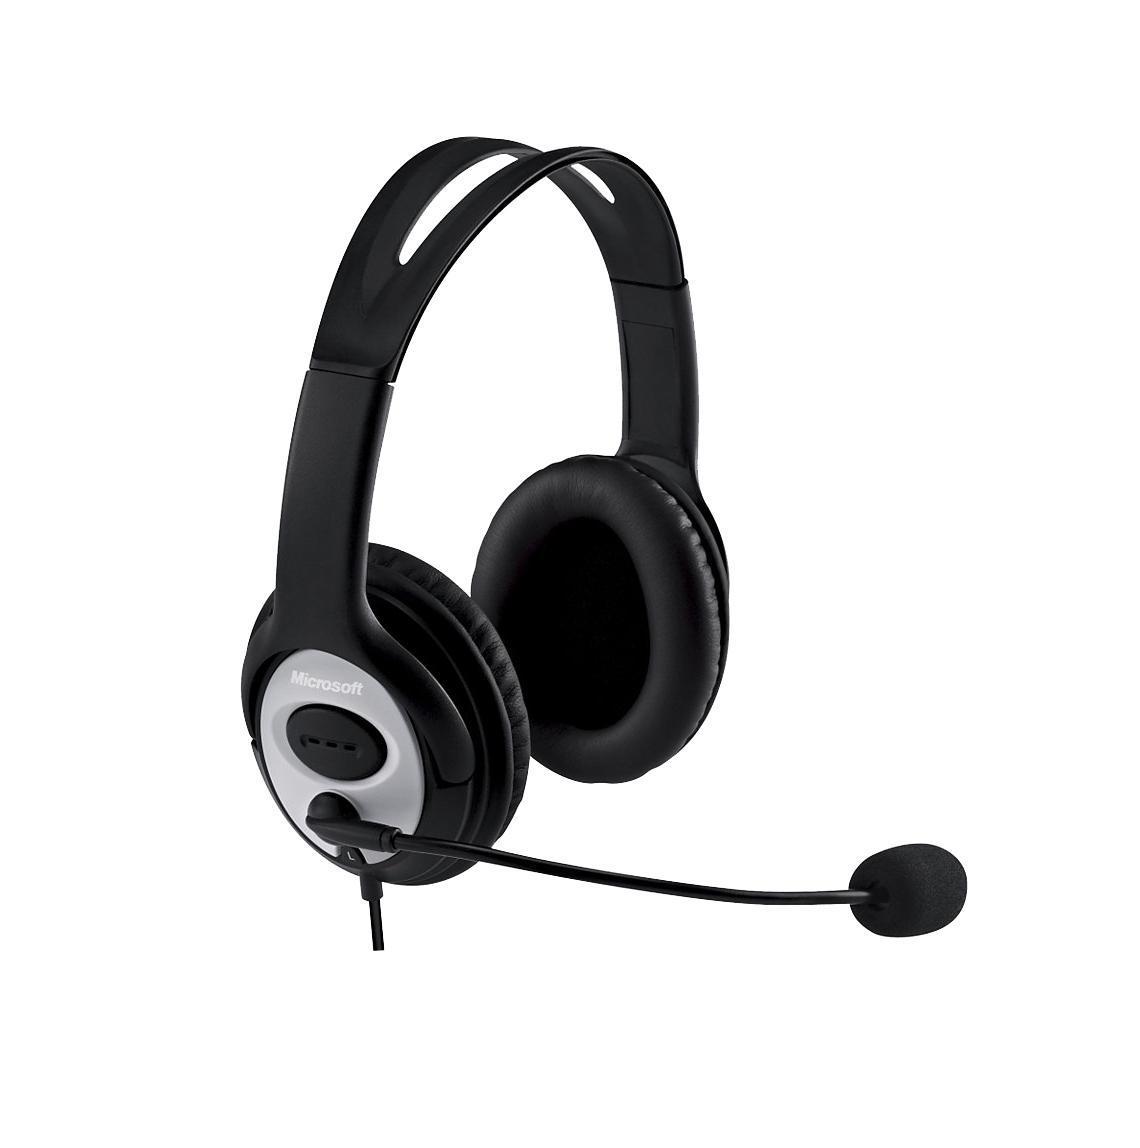 Microsoft LifeChat LX-3000 (JUG-00015)JUG-00015